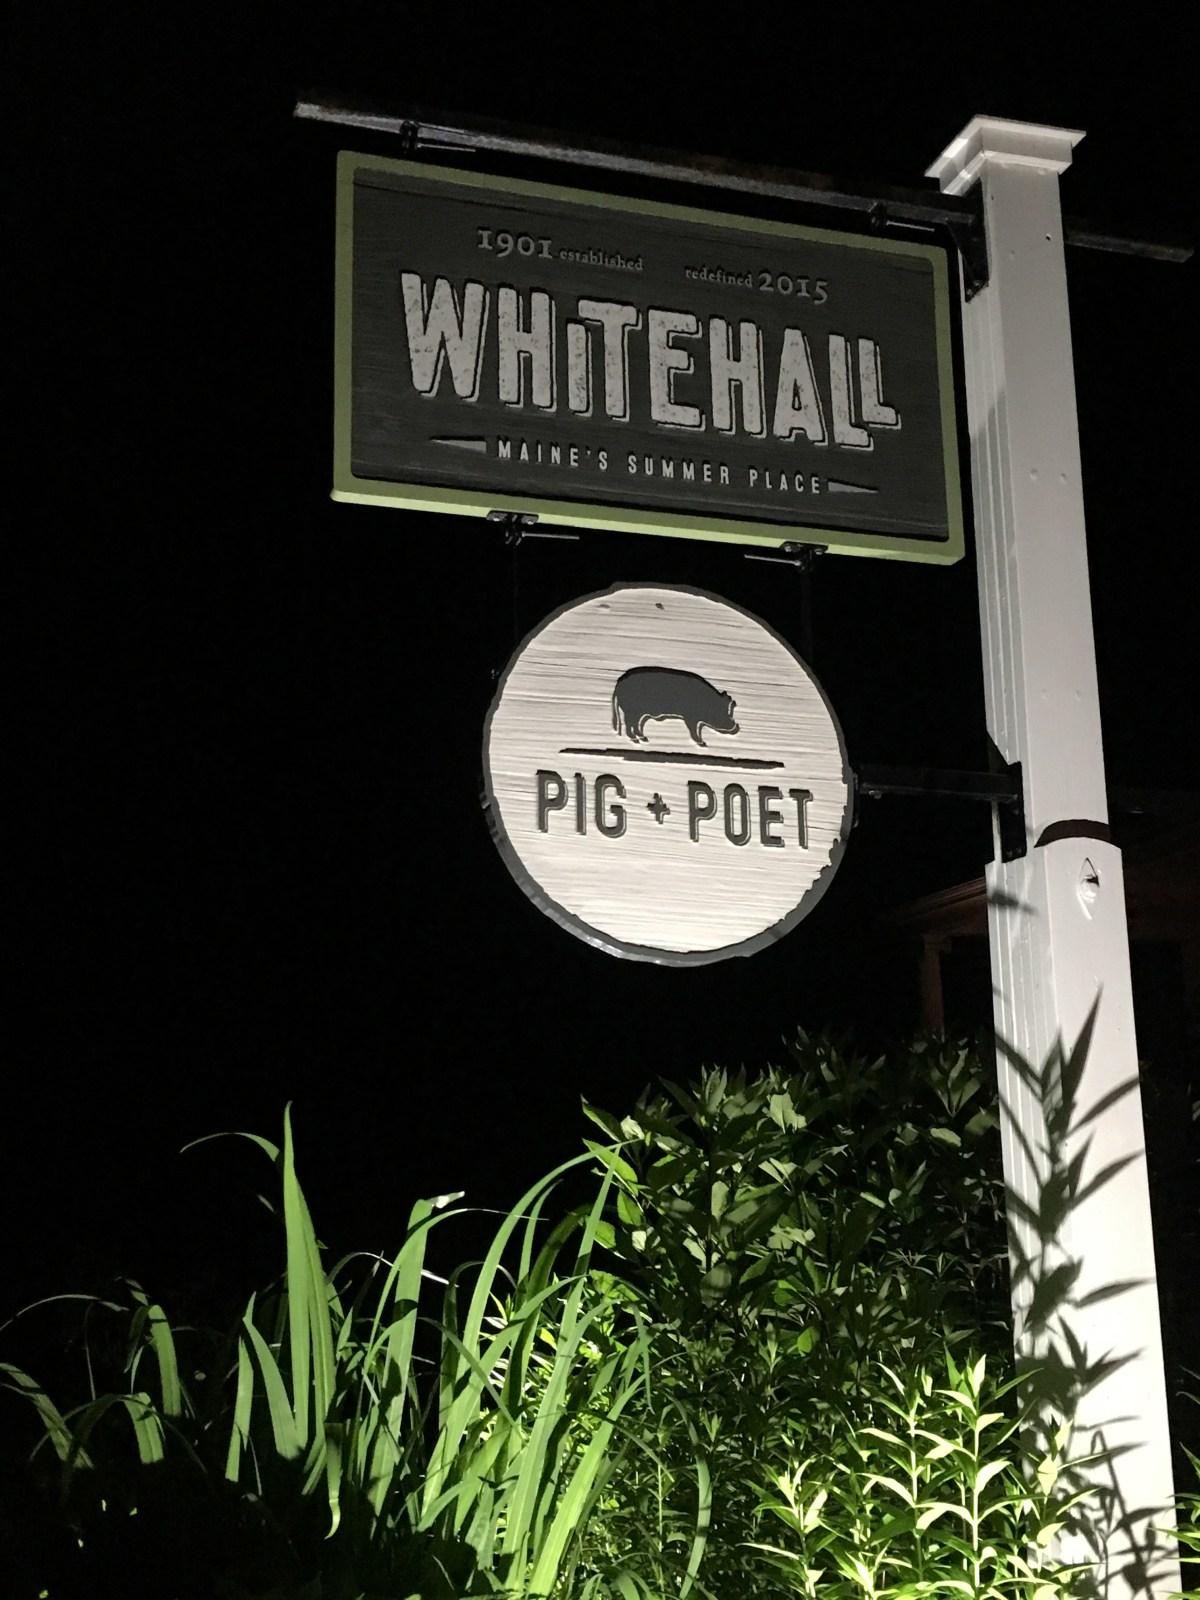 whitehall 1